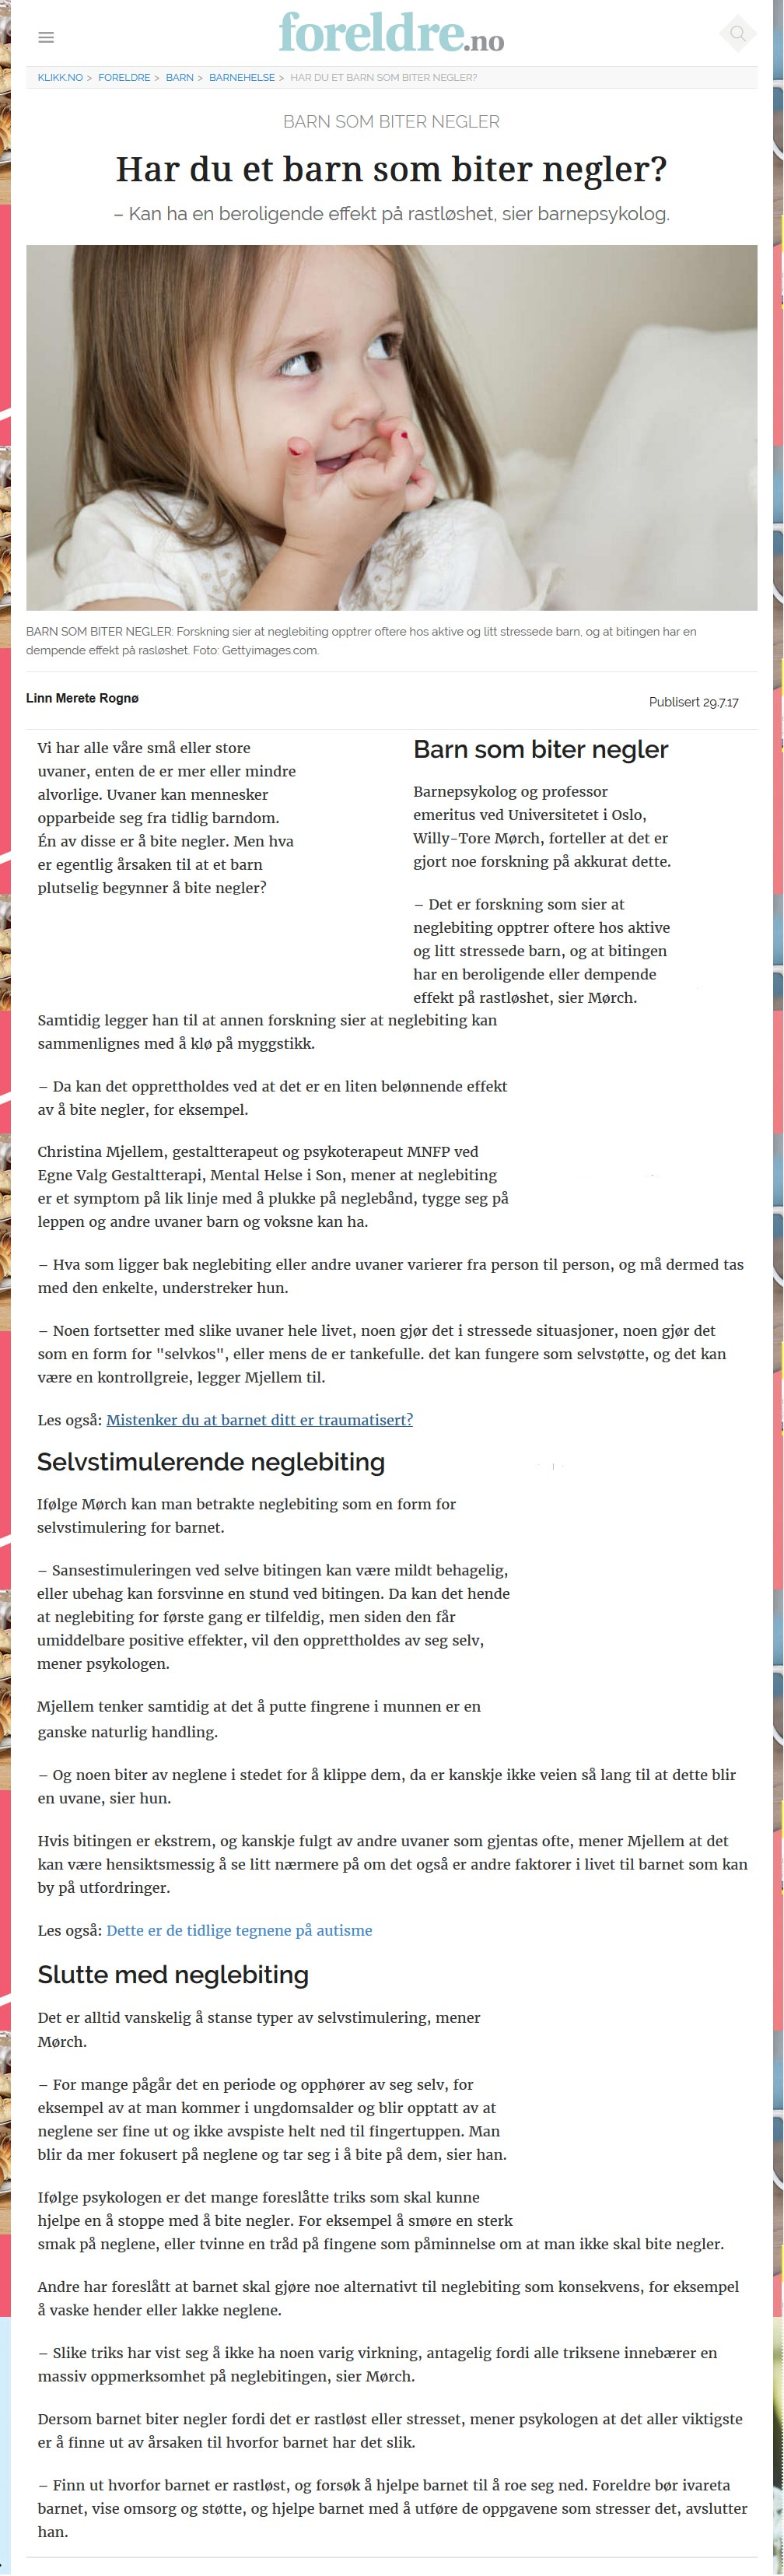 Neglebiting - Christina Mjellem Reg. Gestaltterapeut MNGF